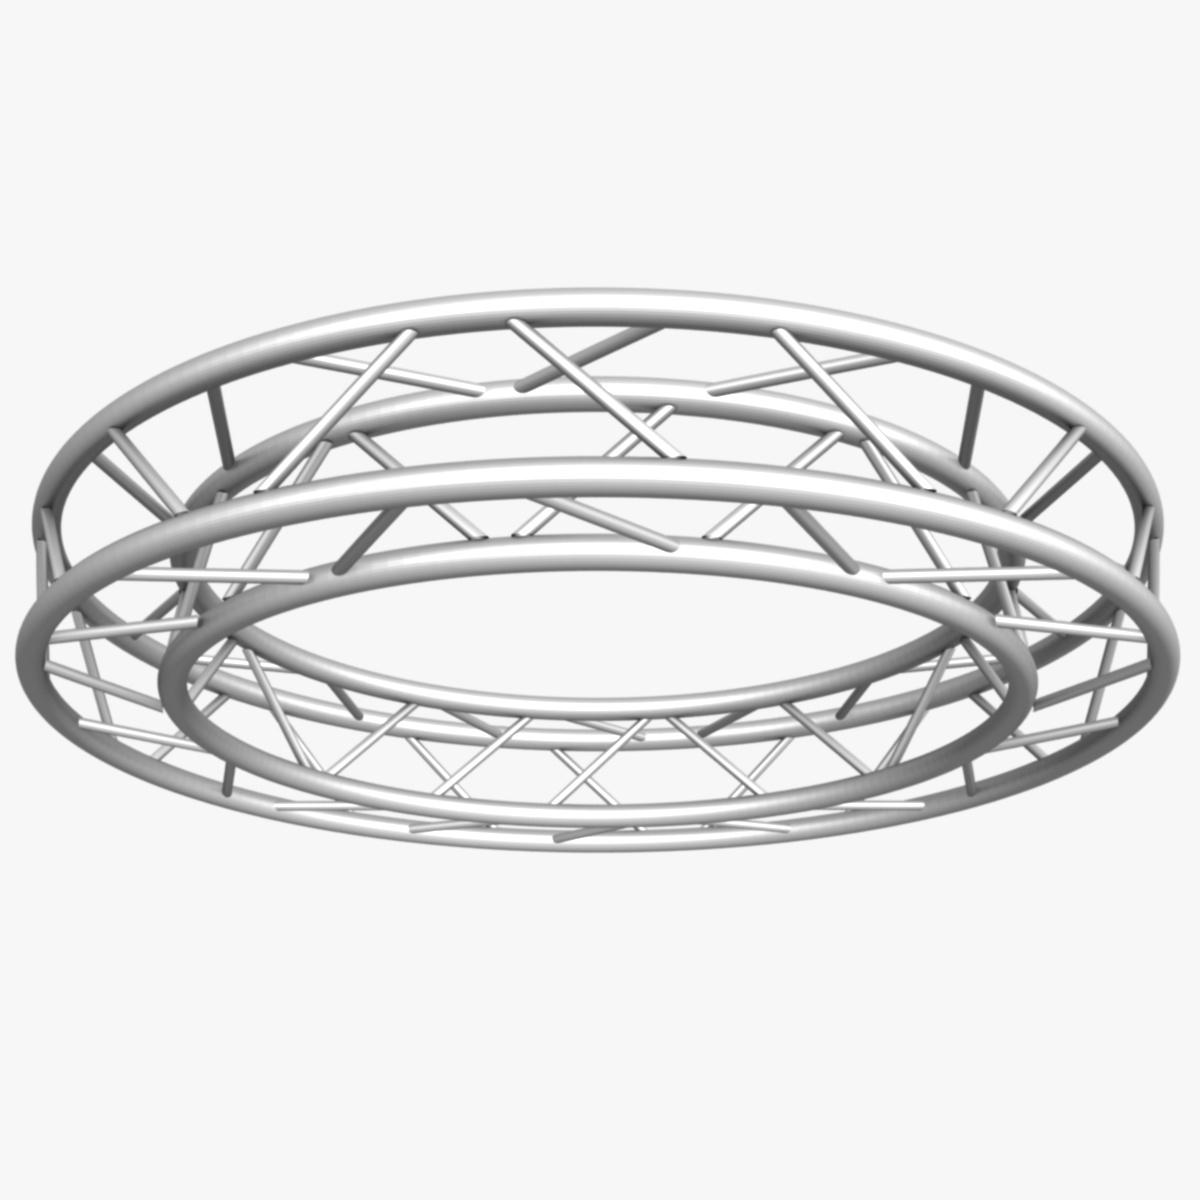 дугуй дөрвөлжин Дотоод (бүрэн диаметр 200cm) 3d загвар 3ds max dxf fbx c4d dae obj 252362